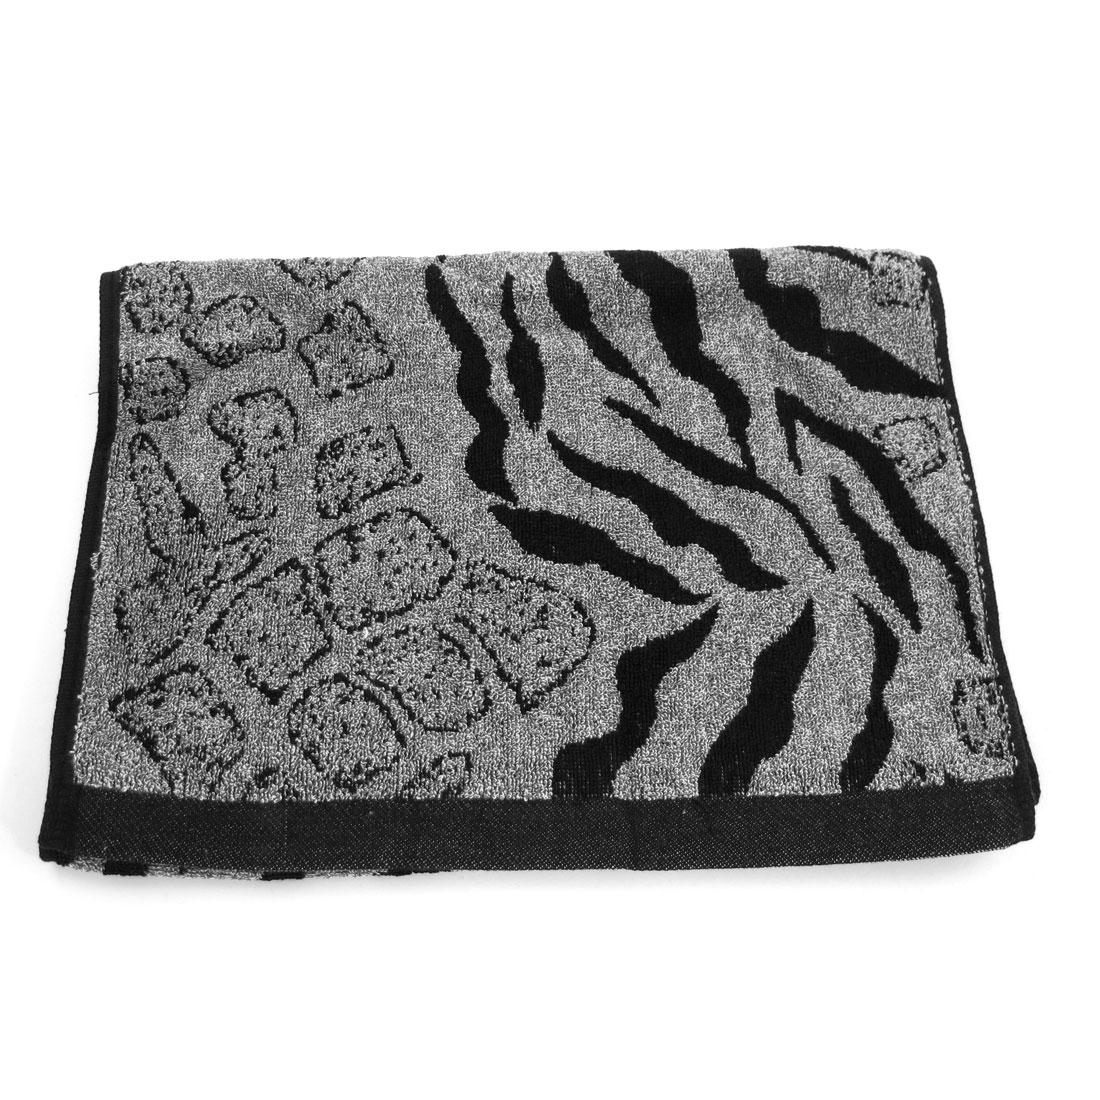 Blcak Light Gray Zebra Pattern Rectangle Shaped Washing Terry Towel